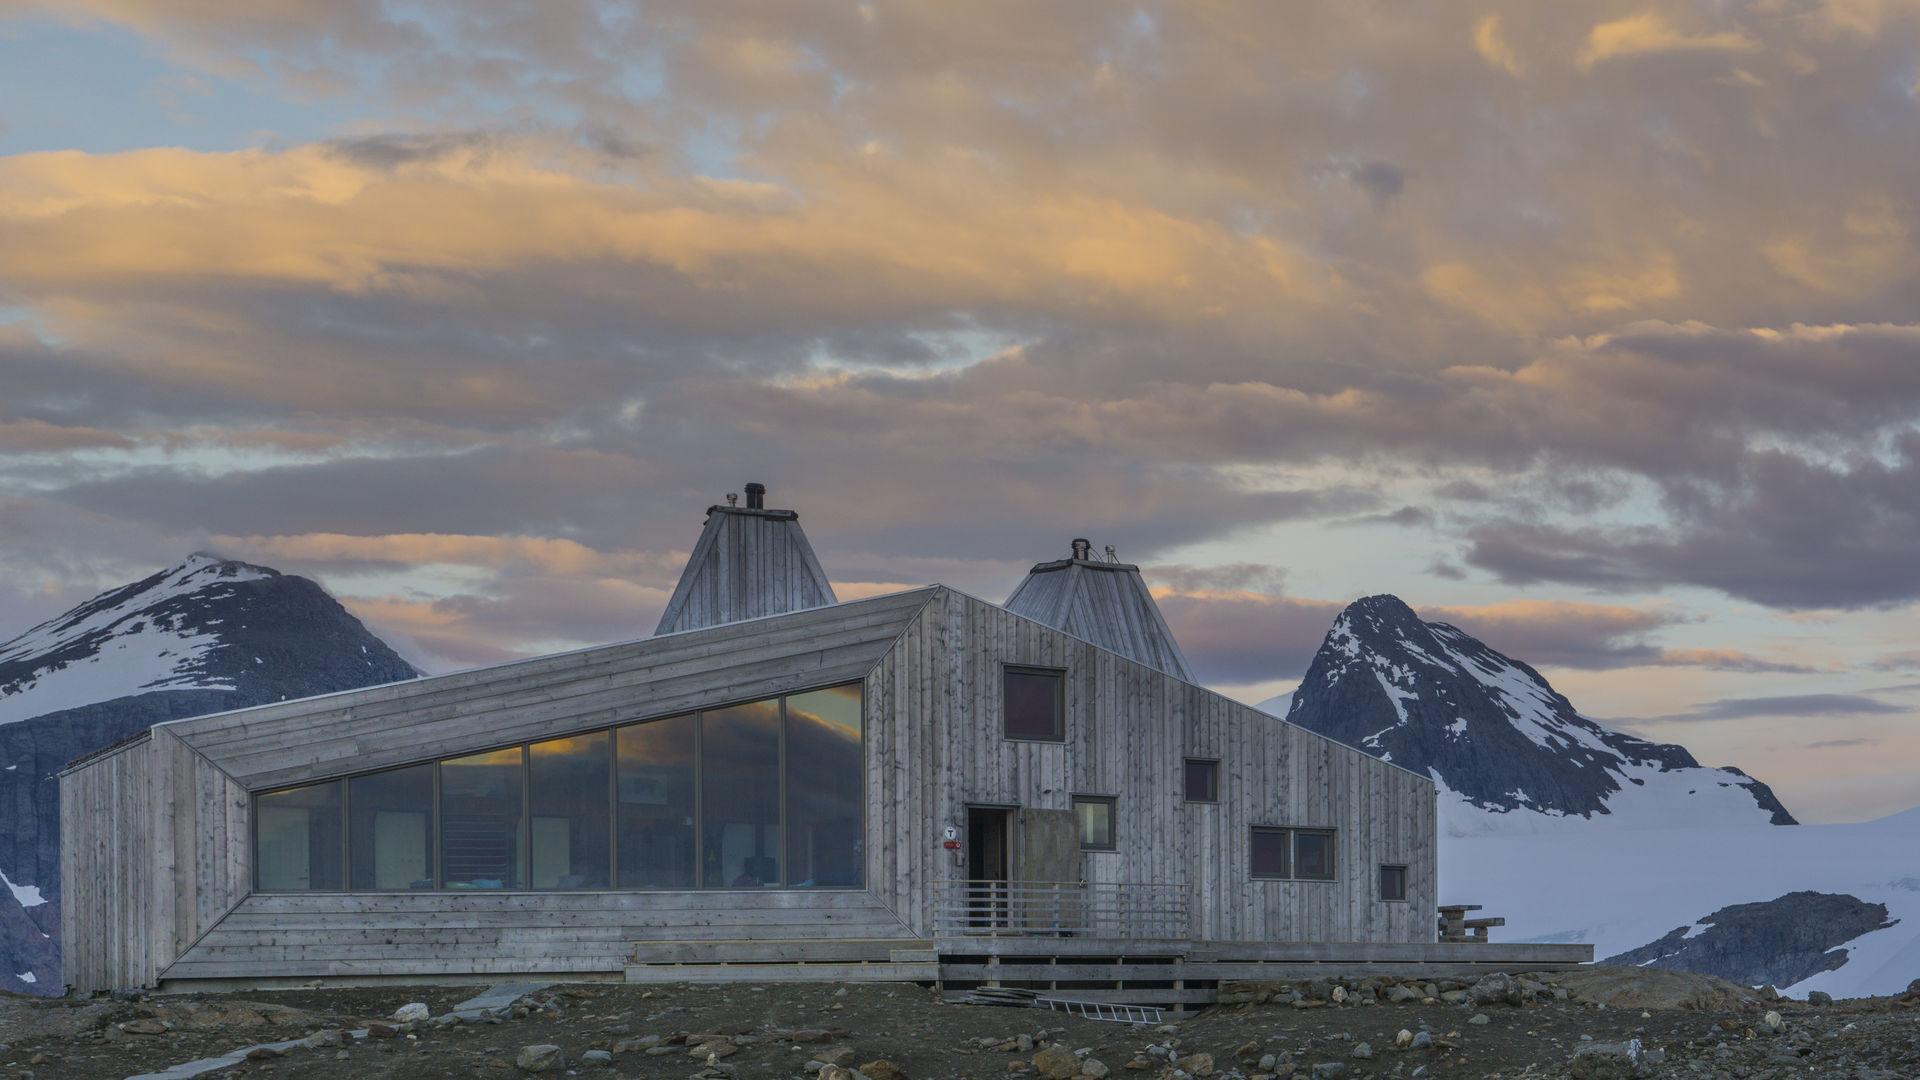 The Rabot cabin is a architectural masterpiece (©) Jan Inge Larsen